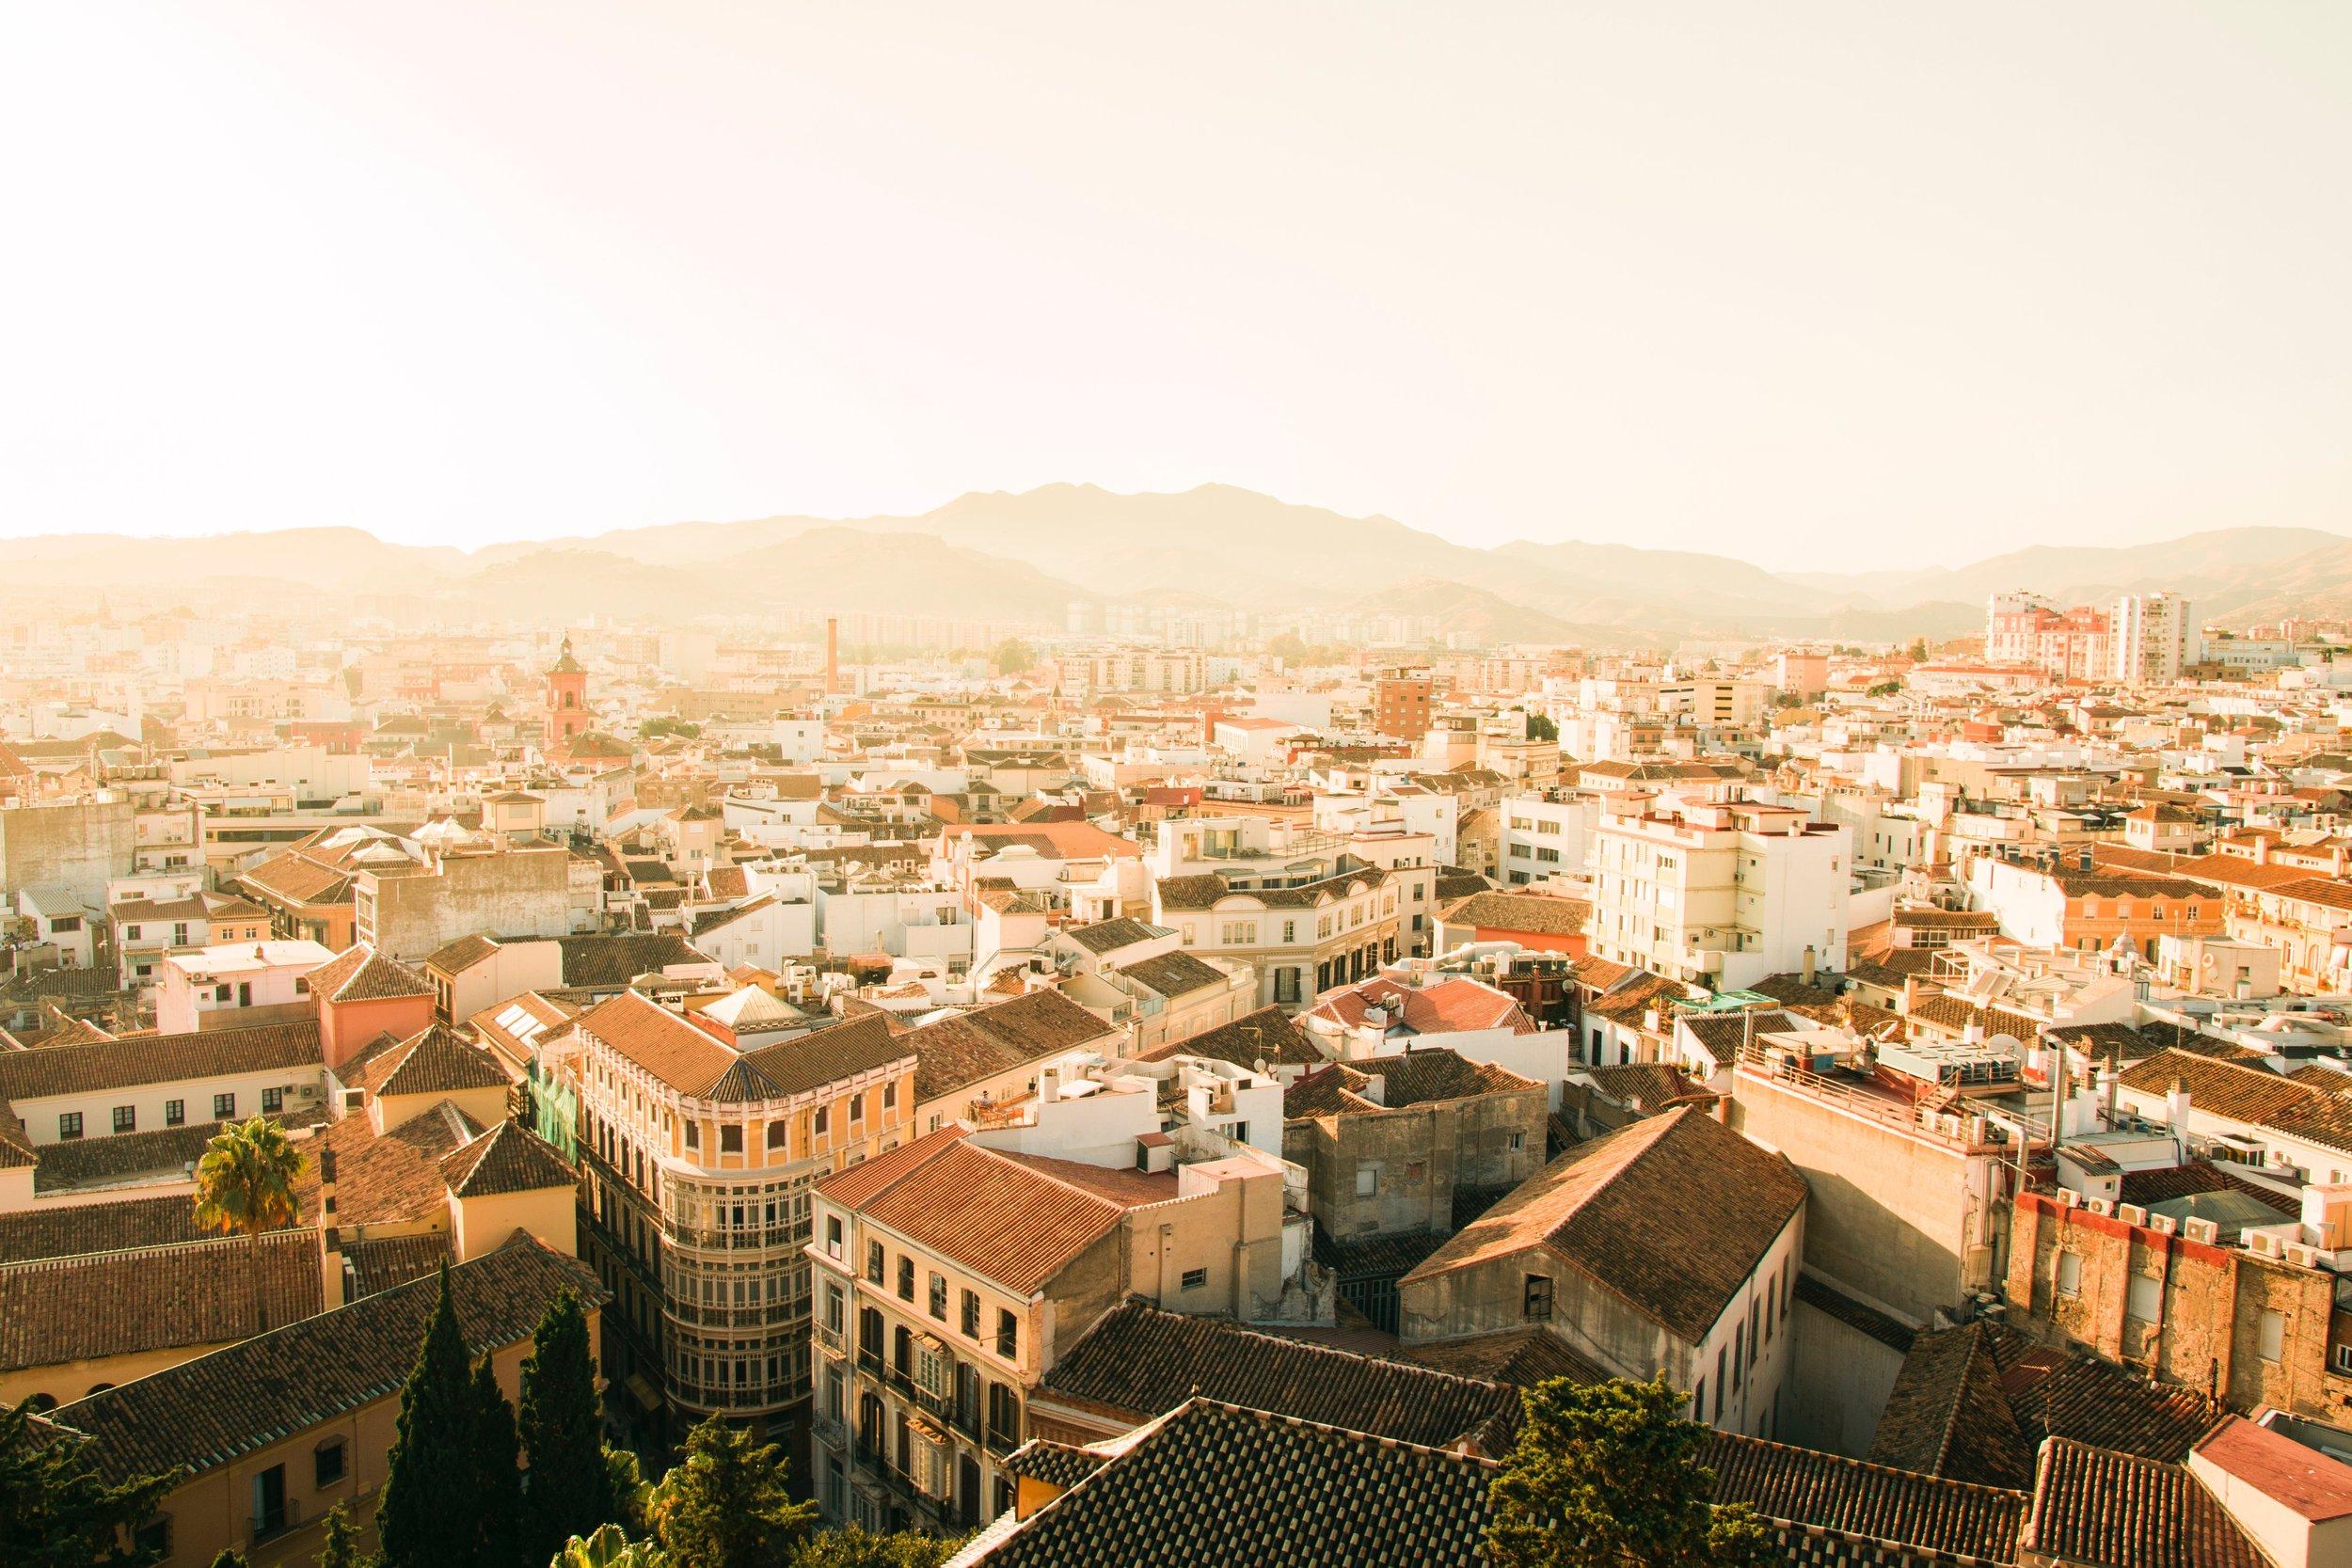 barcelona-buildings-city-17658.jpg